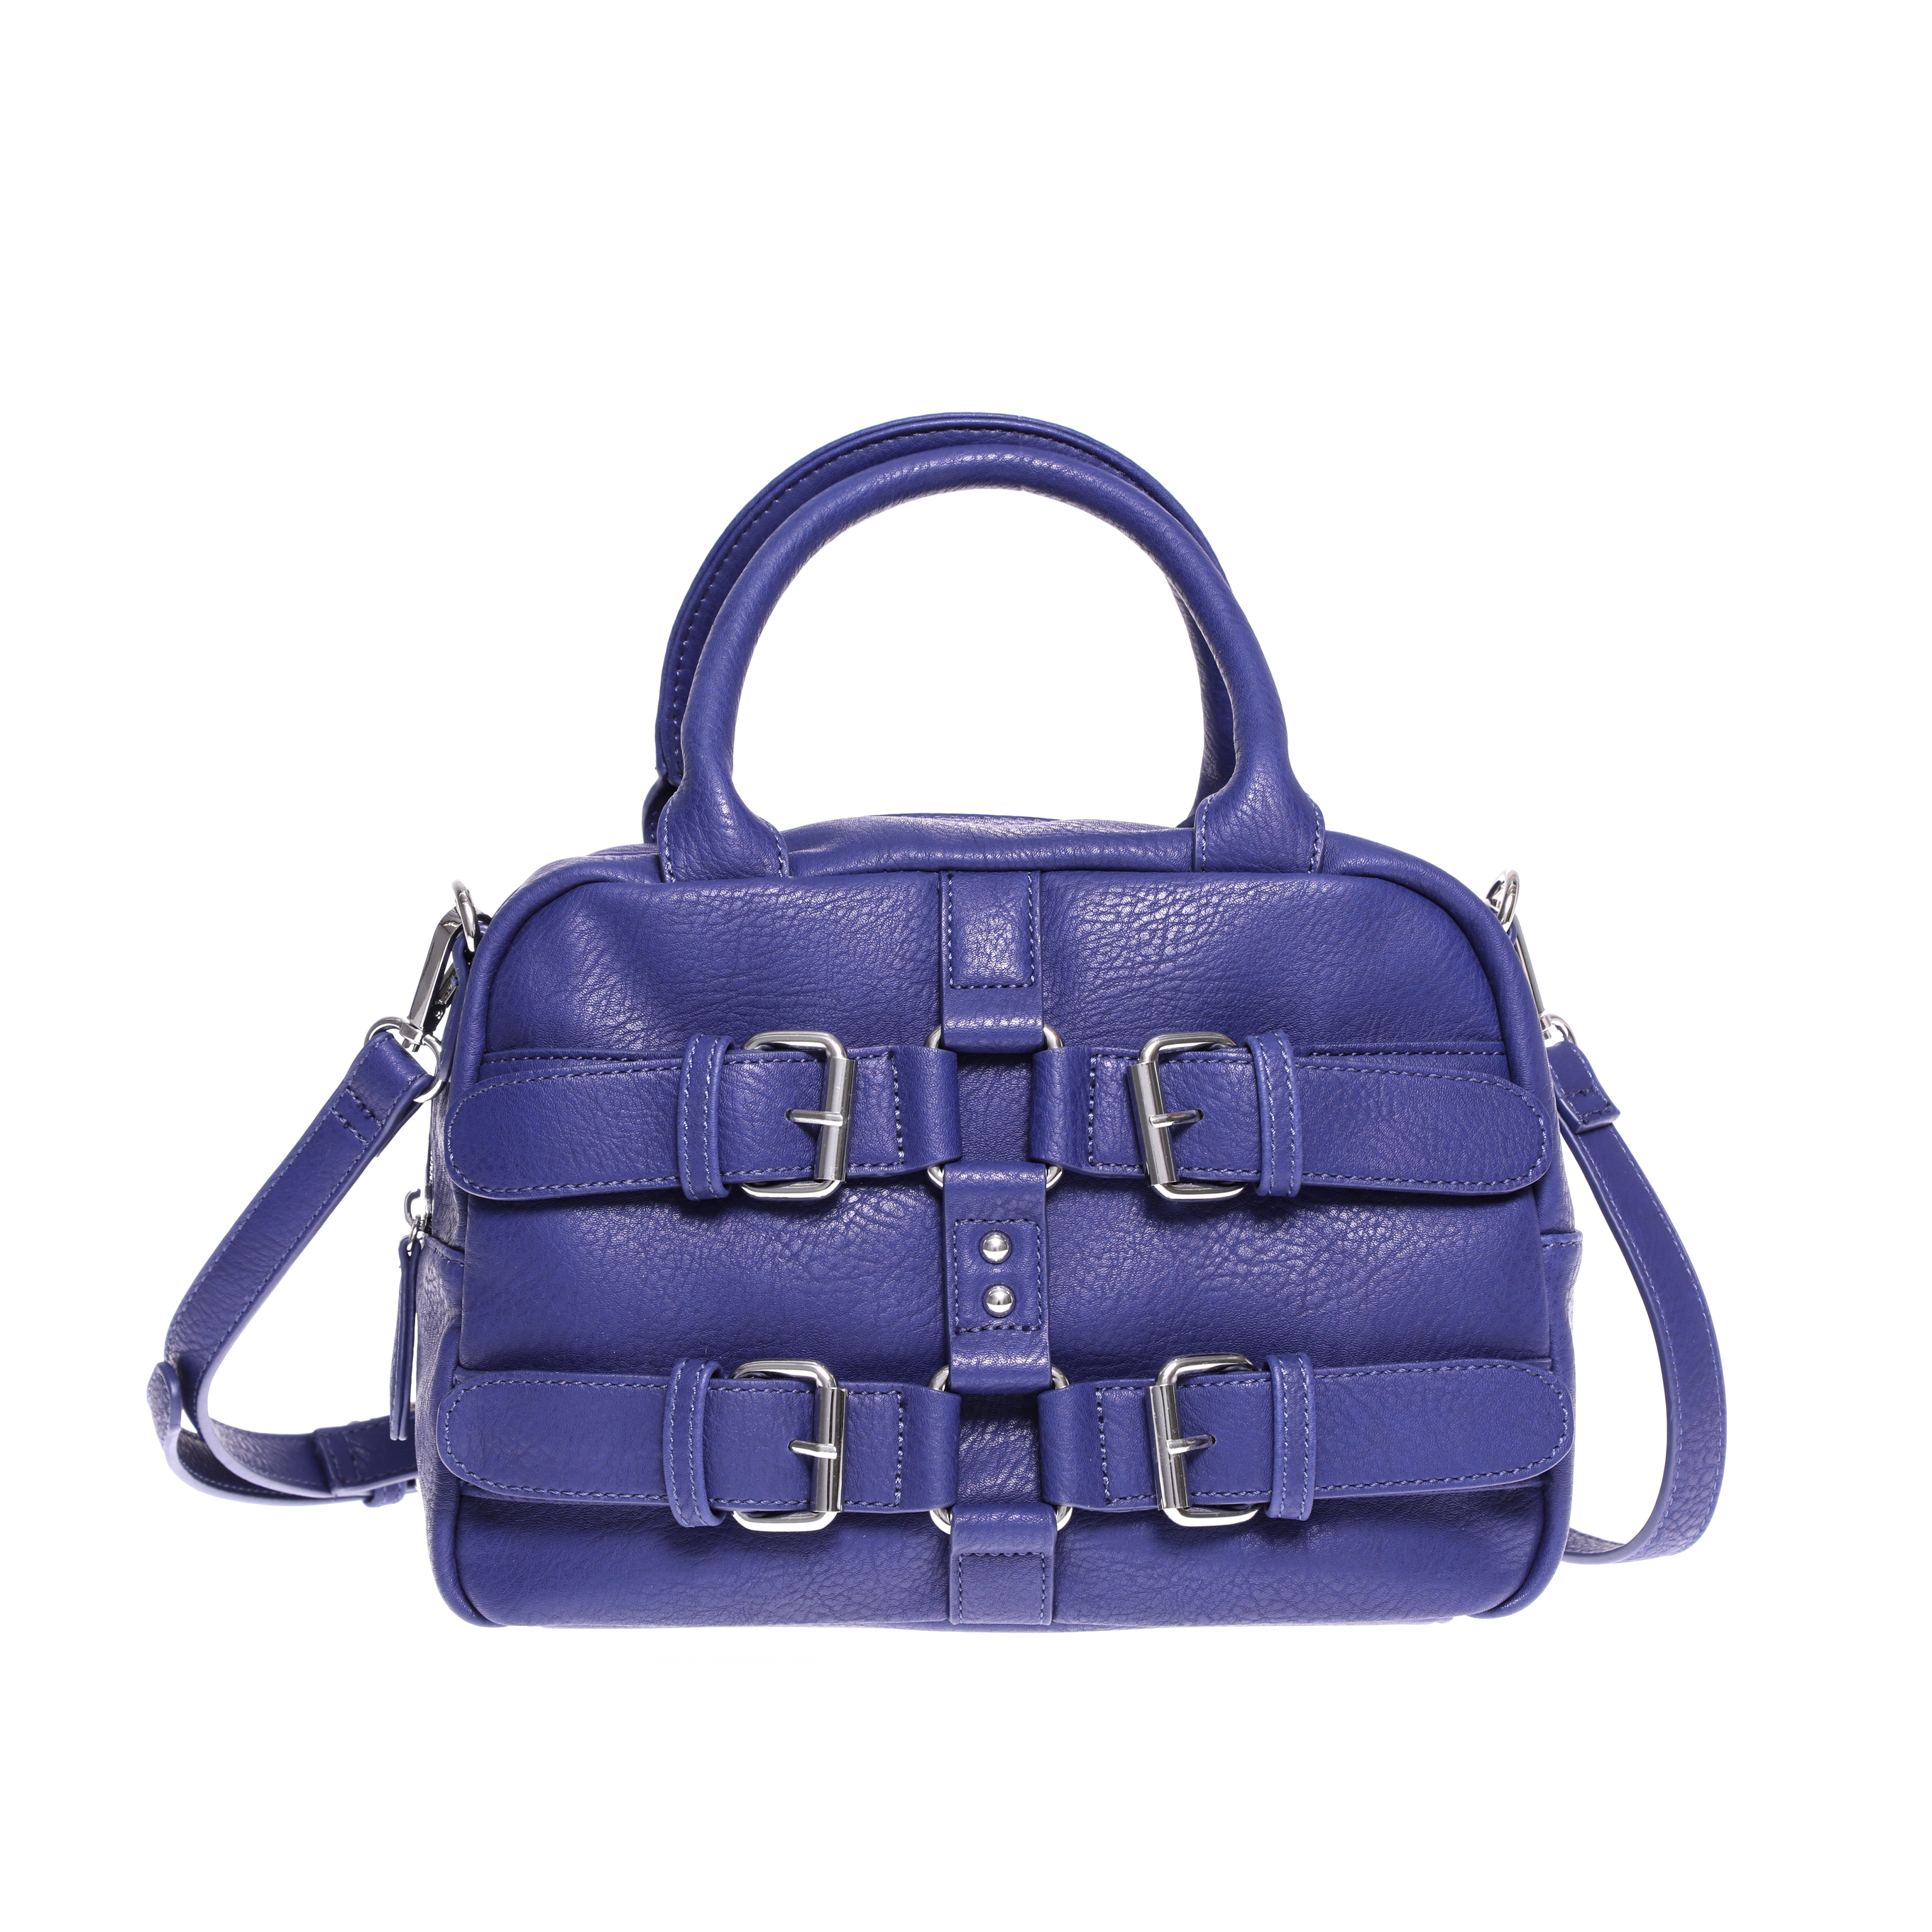 DENNY ROSE – Γυναικεία τσάντα Denny Rose μπλε-μωβ